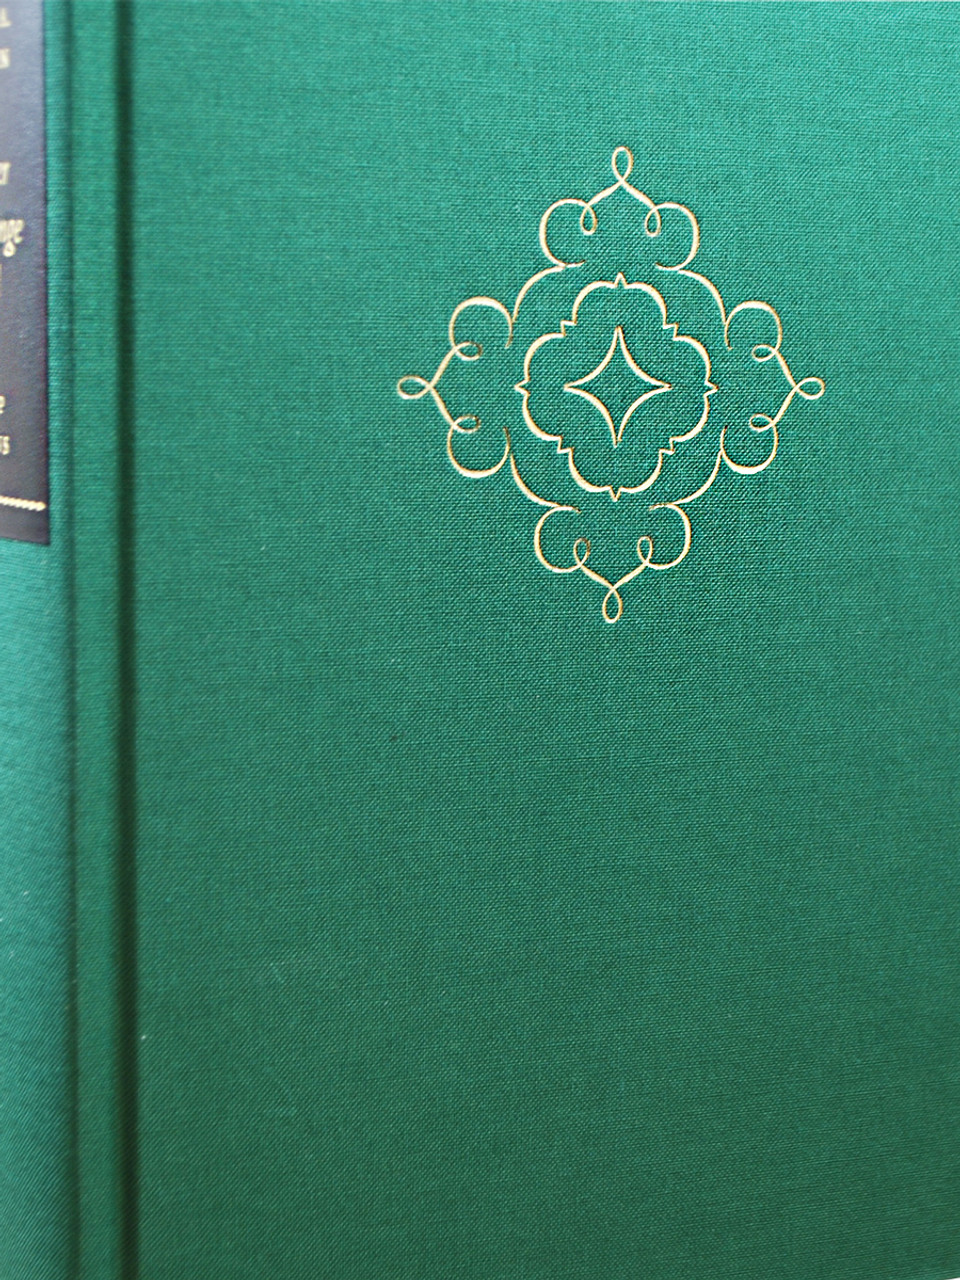 "Robert A. Heinlein ""Stranger In A Strange Land"" Signed Limited Artist Edition of 750, Slipcased [Sealed]"